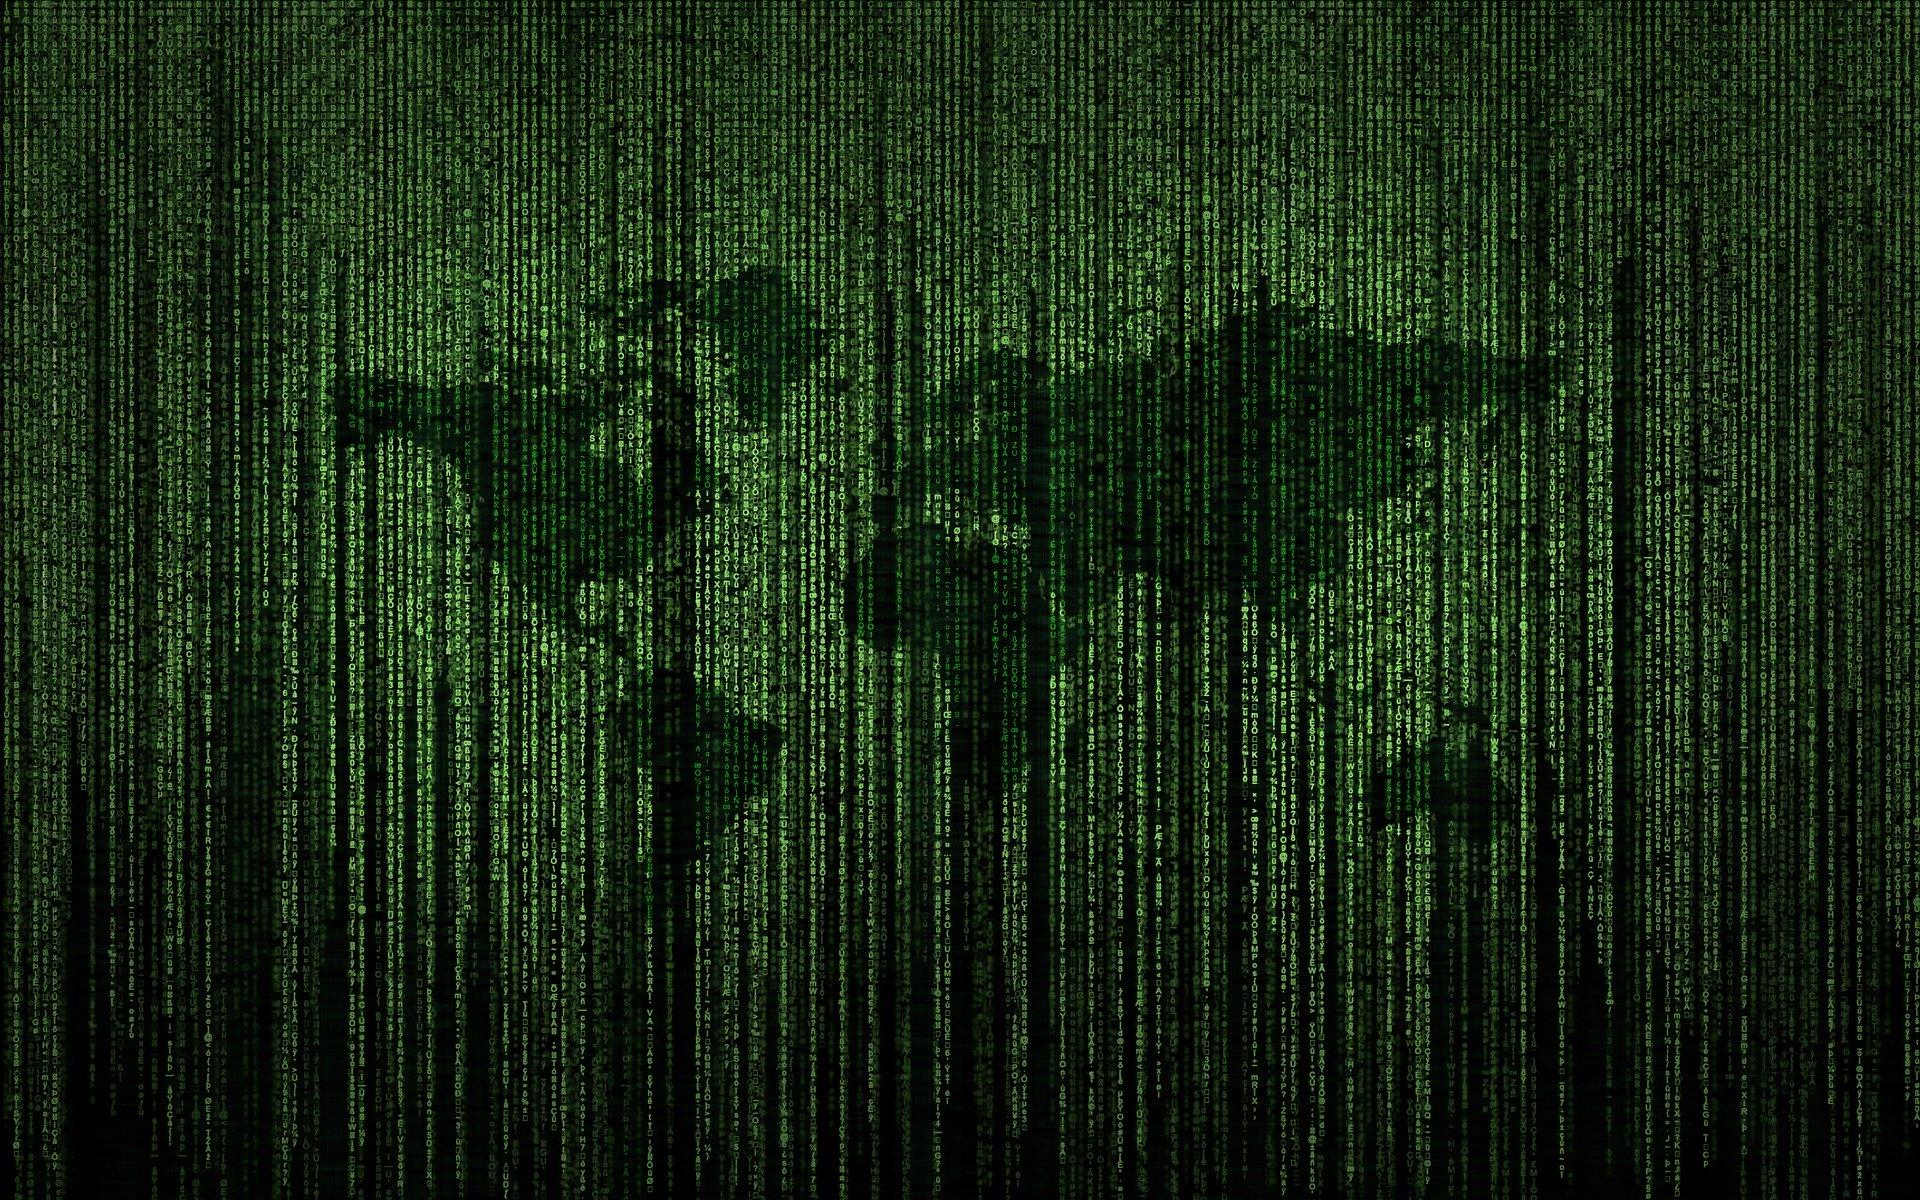 image of data matrix